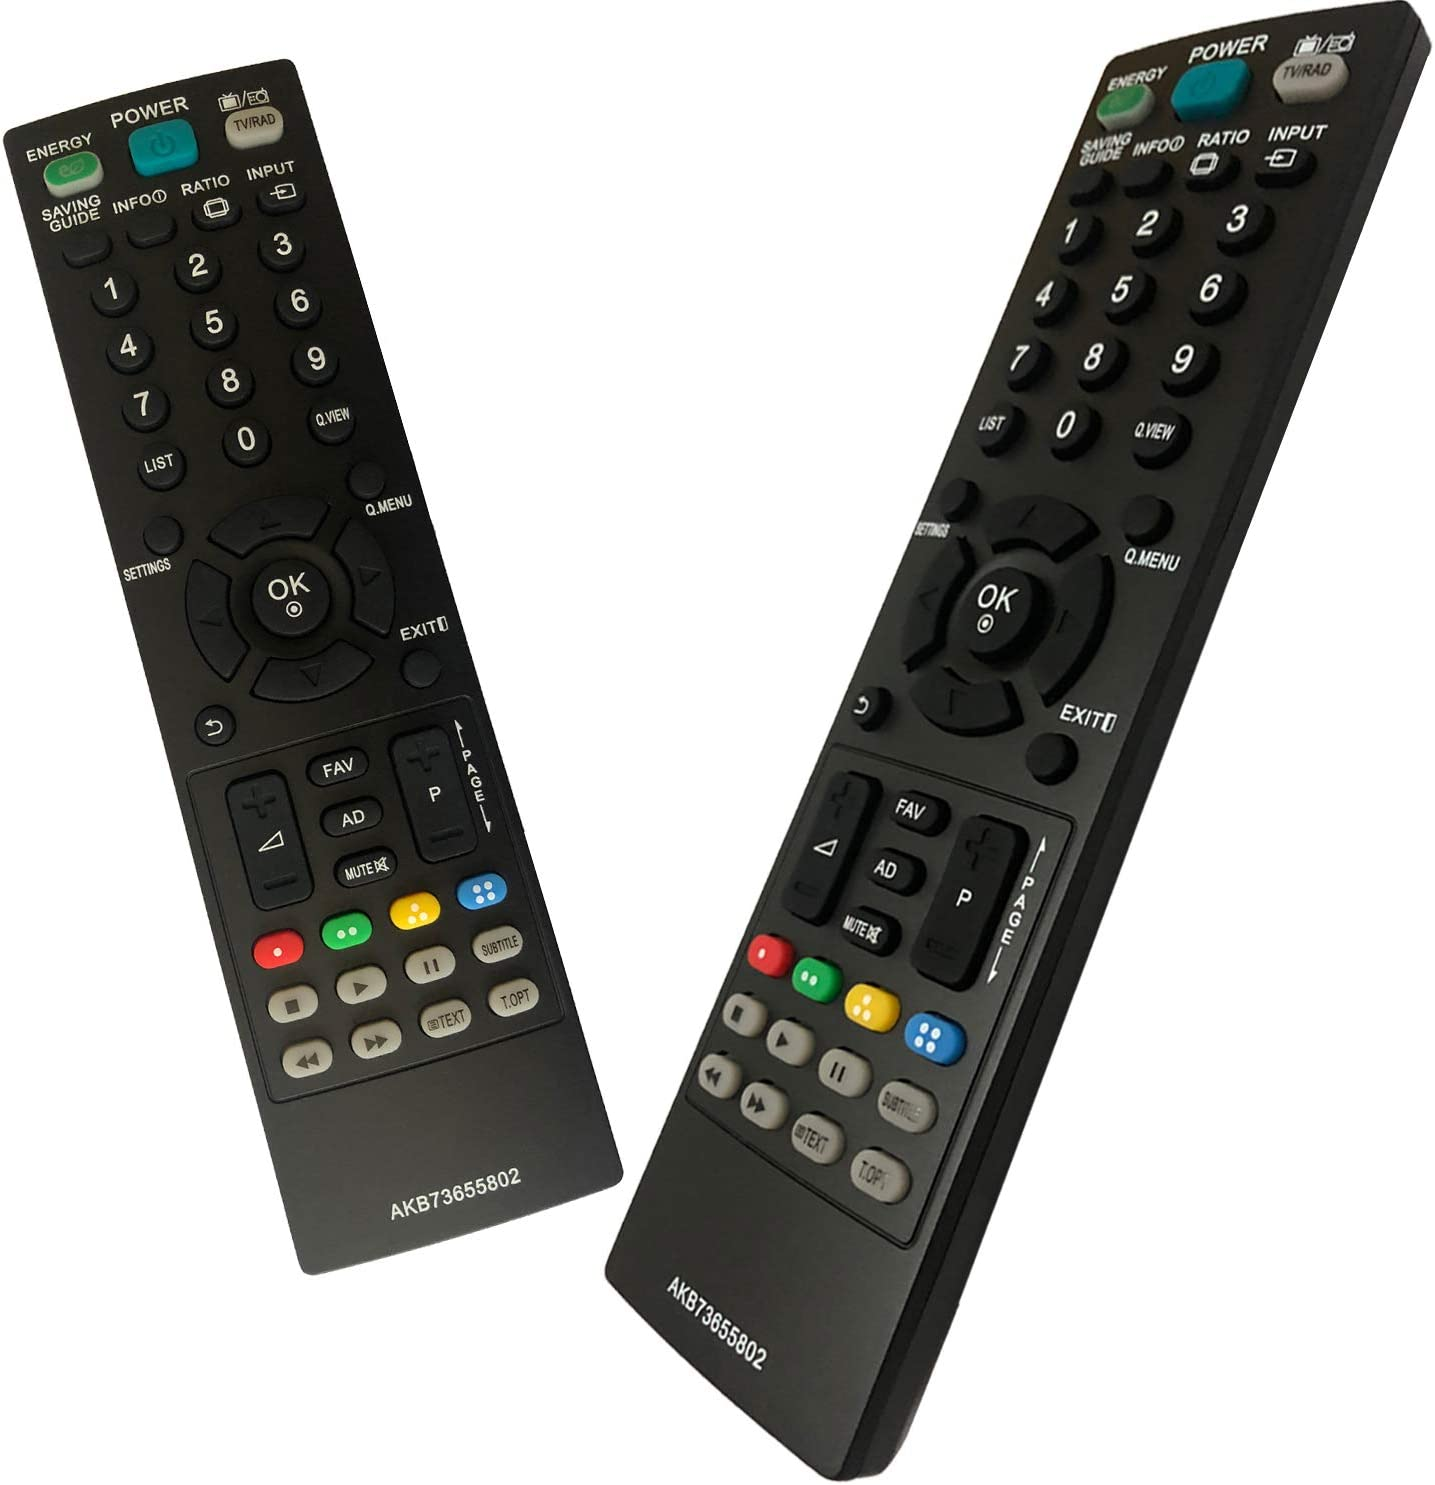 iLovely Universal Control Remoto AKB73655802 para LG Smart TV: Amazon.es: Electrónica